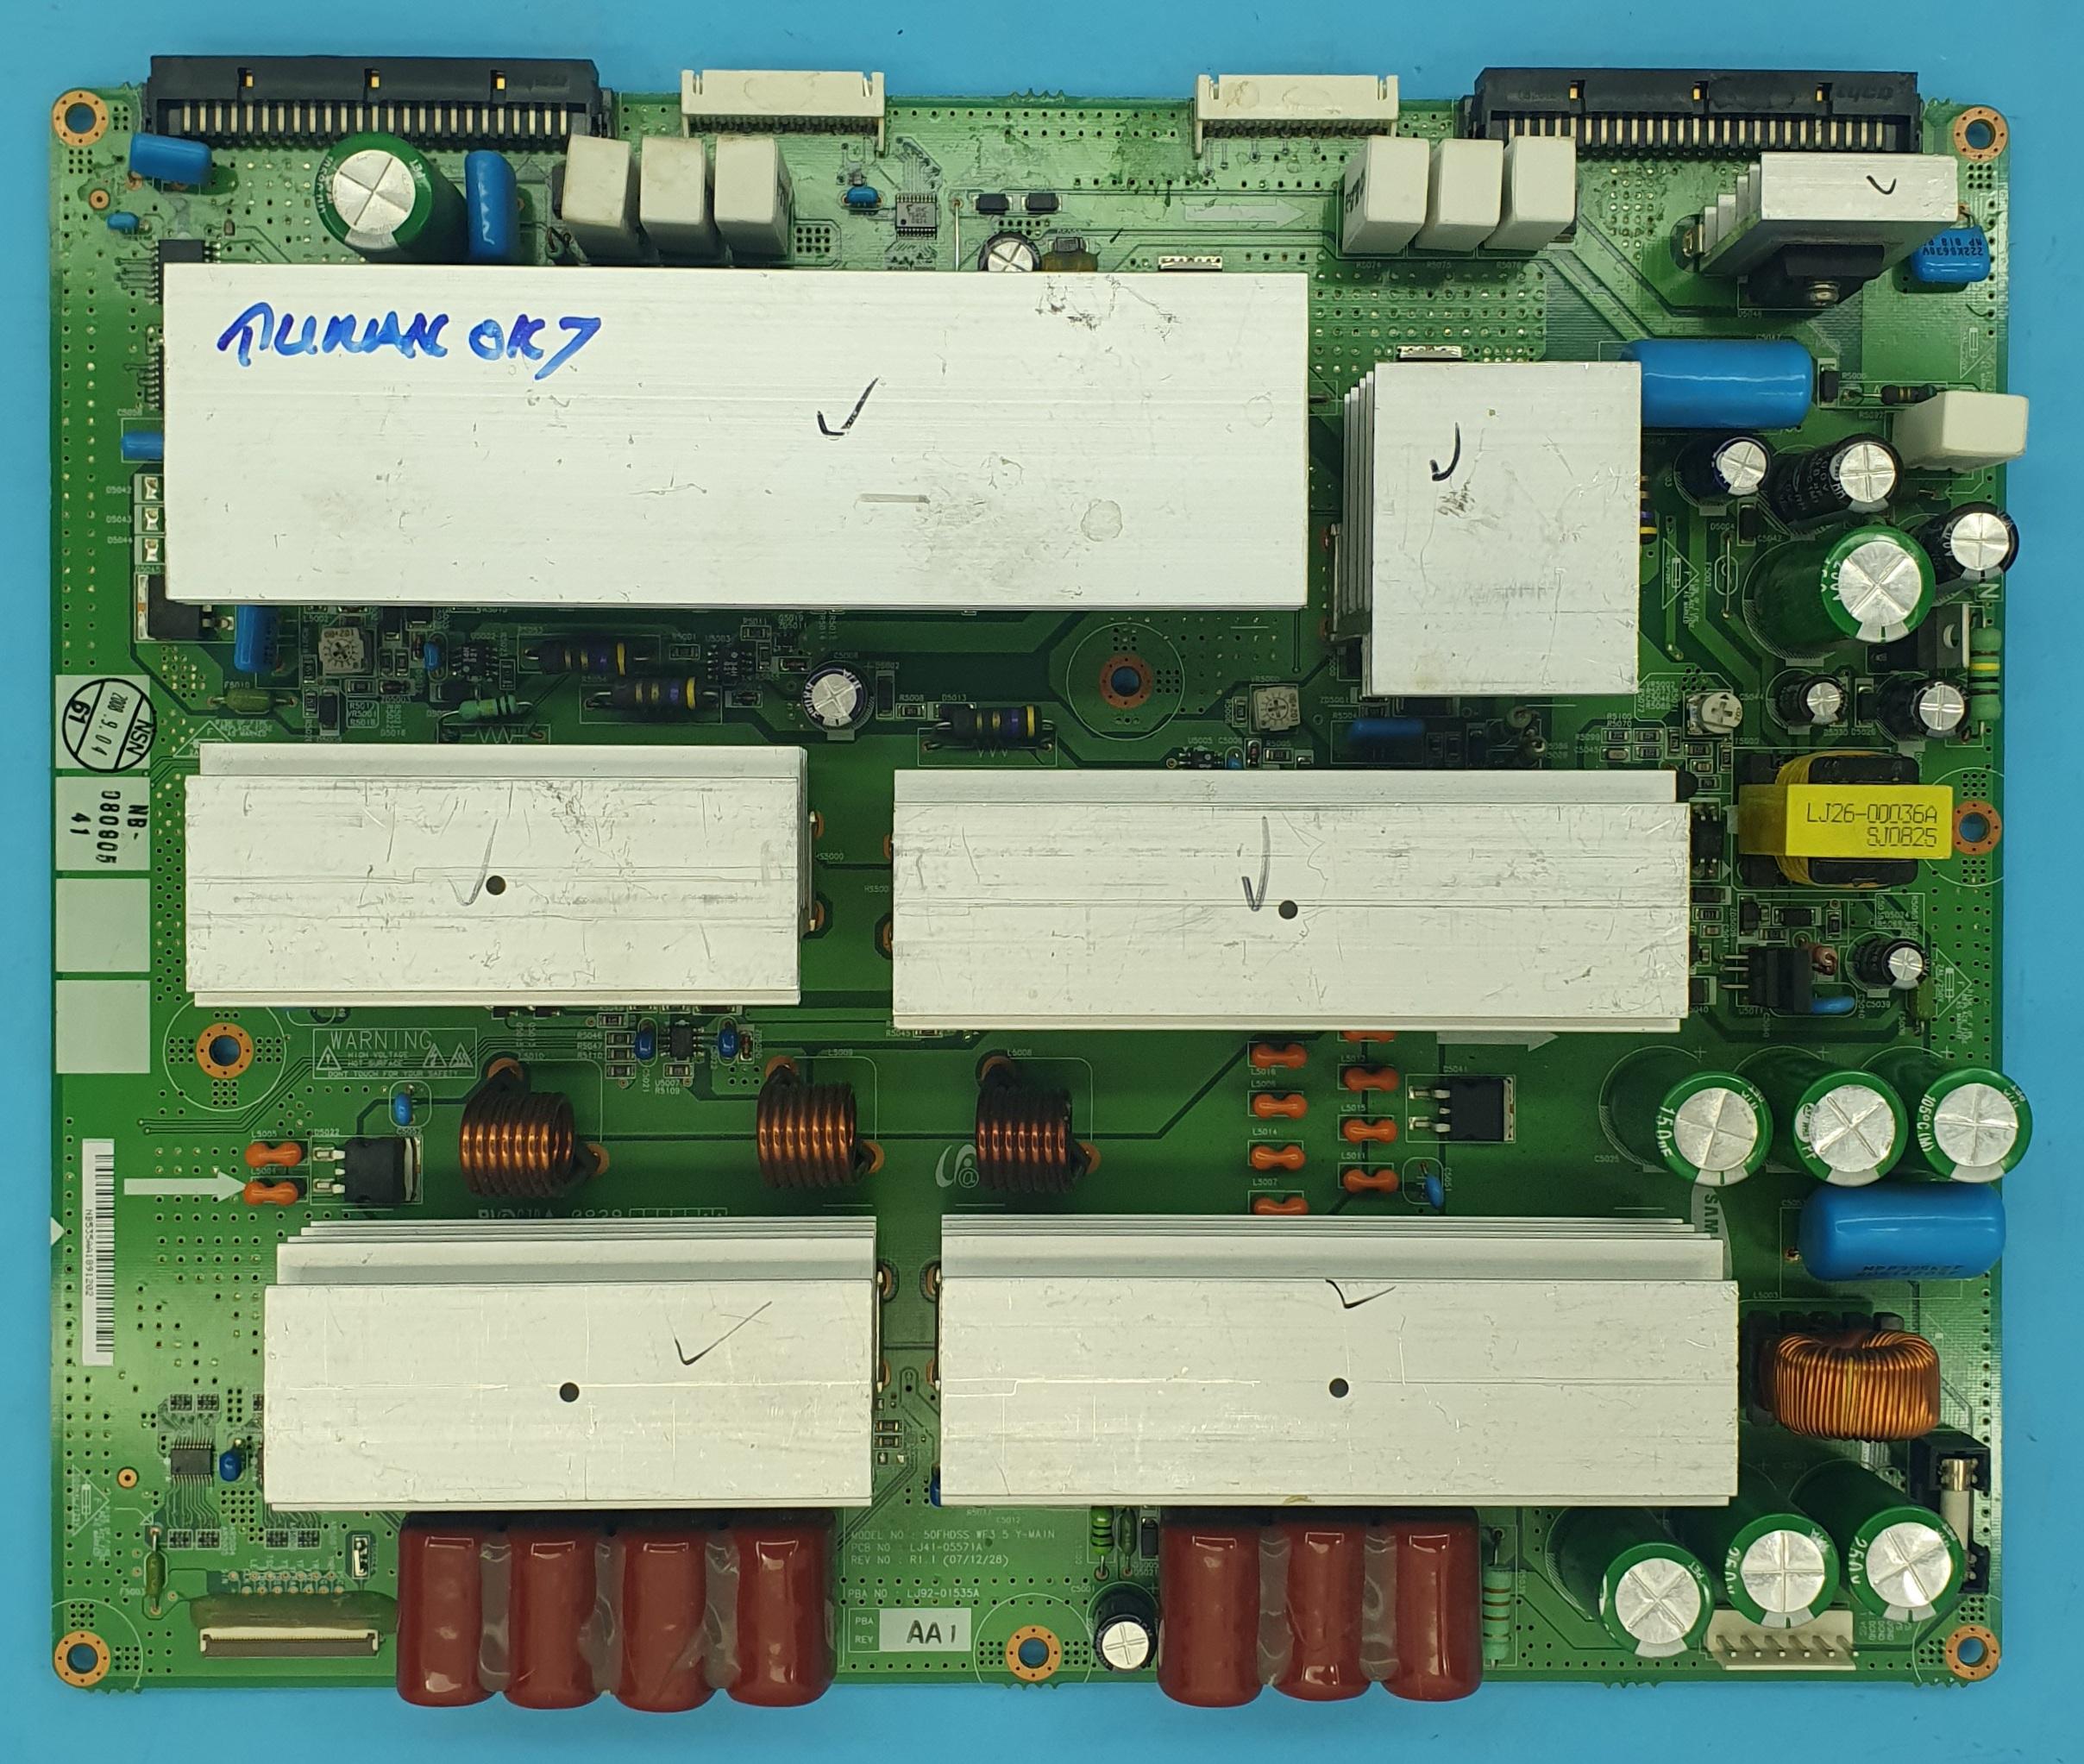 LJ41-05571A Samsung Y-SUS (KDV DAHİL = 200 TL)